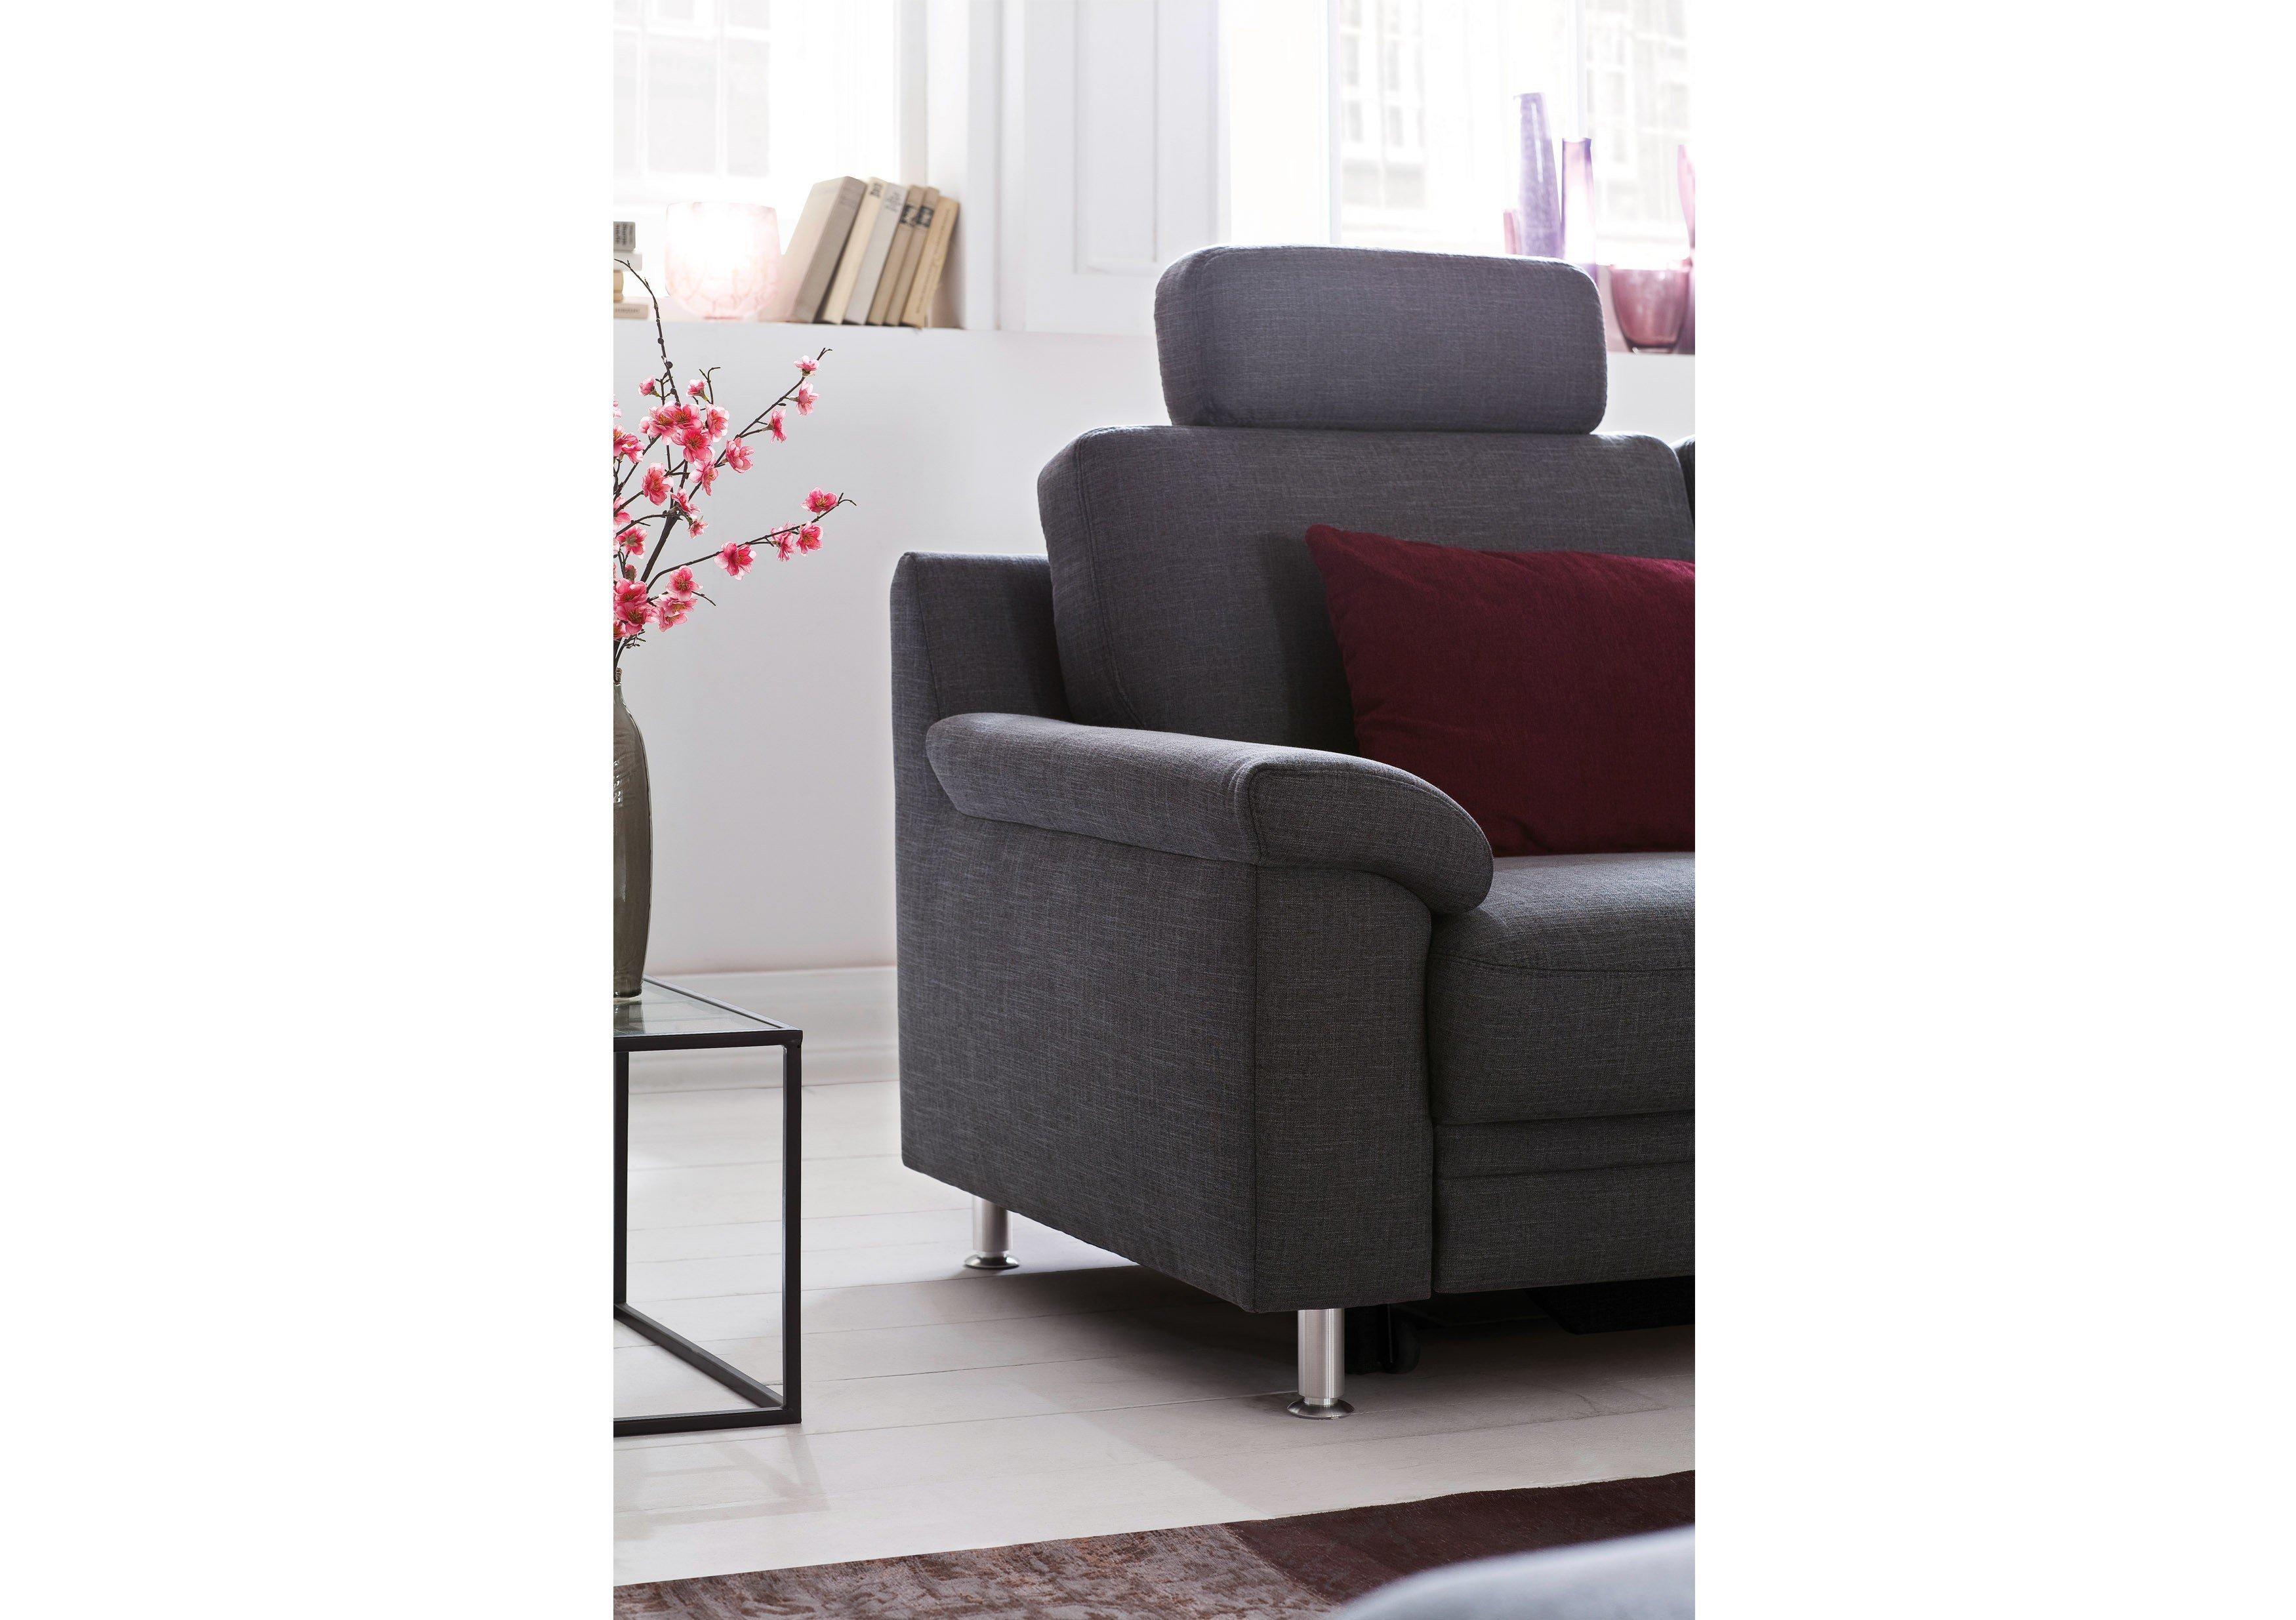 carina polsterm bel cora polsterecke in grau m bel letz ihr online shop. Black Bedroom Furniture Sets. Home Design Ideas